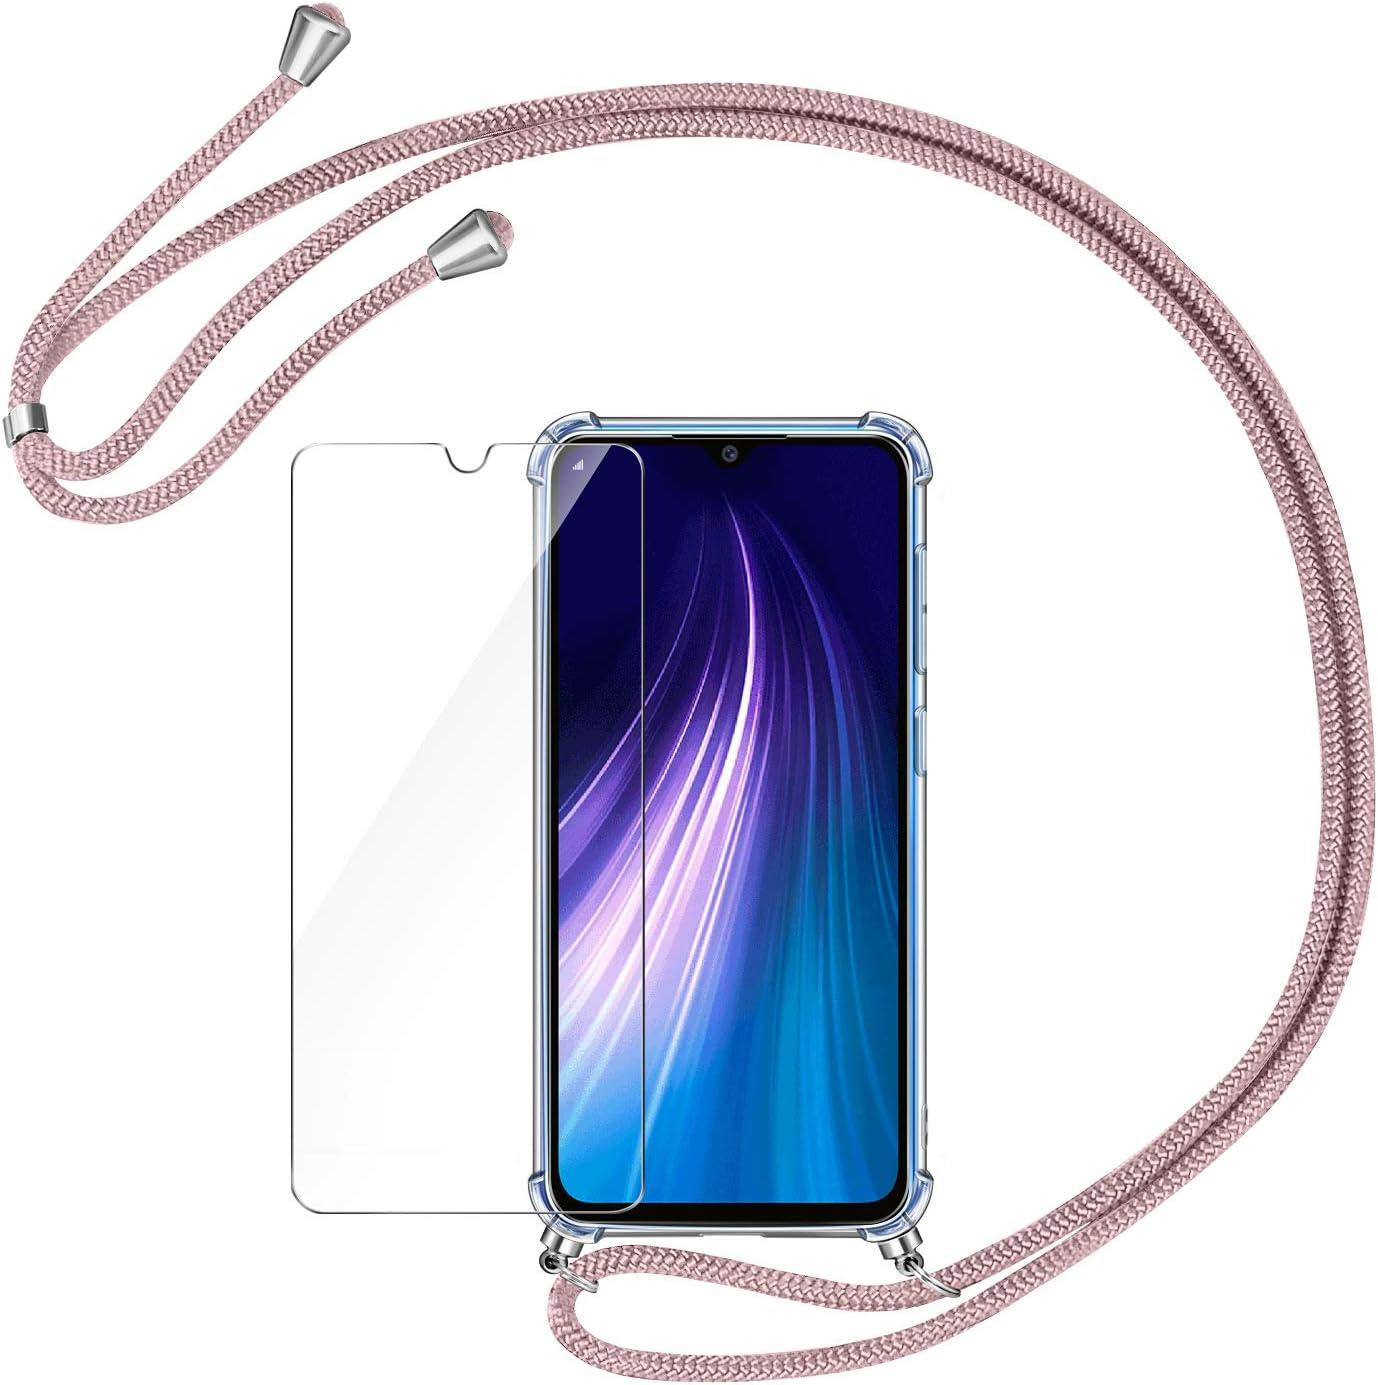 AROYI Funda con Cuerda para Xiaomi Redmi Note 8 + Protector Pantalla, Carcasa Transparente TPU Silicona Case con Colgante Ajustable Collar Correa de Cuello Cordón para Xiaomi Redmi Note 8 - Oro Rosa